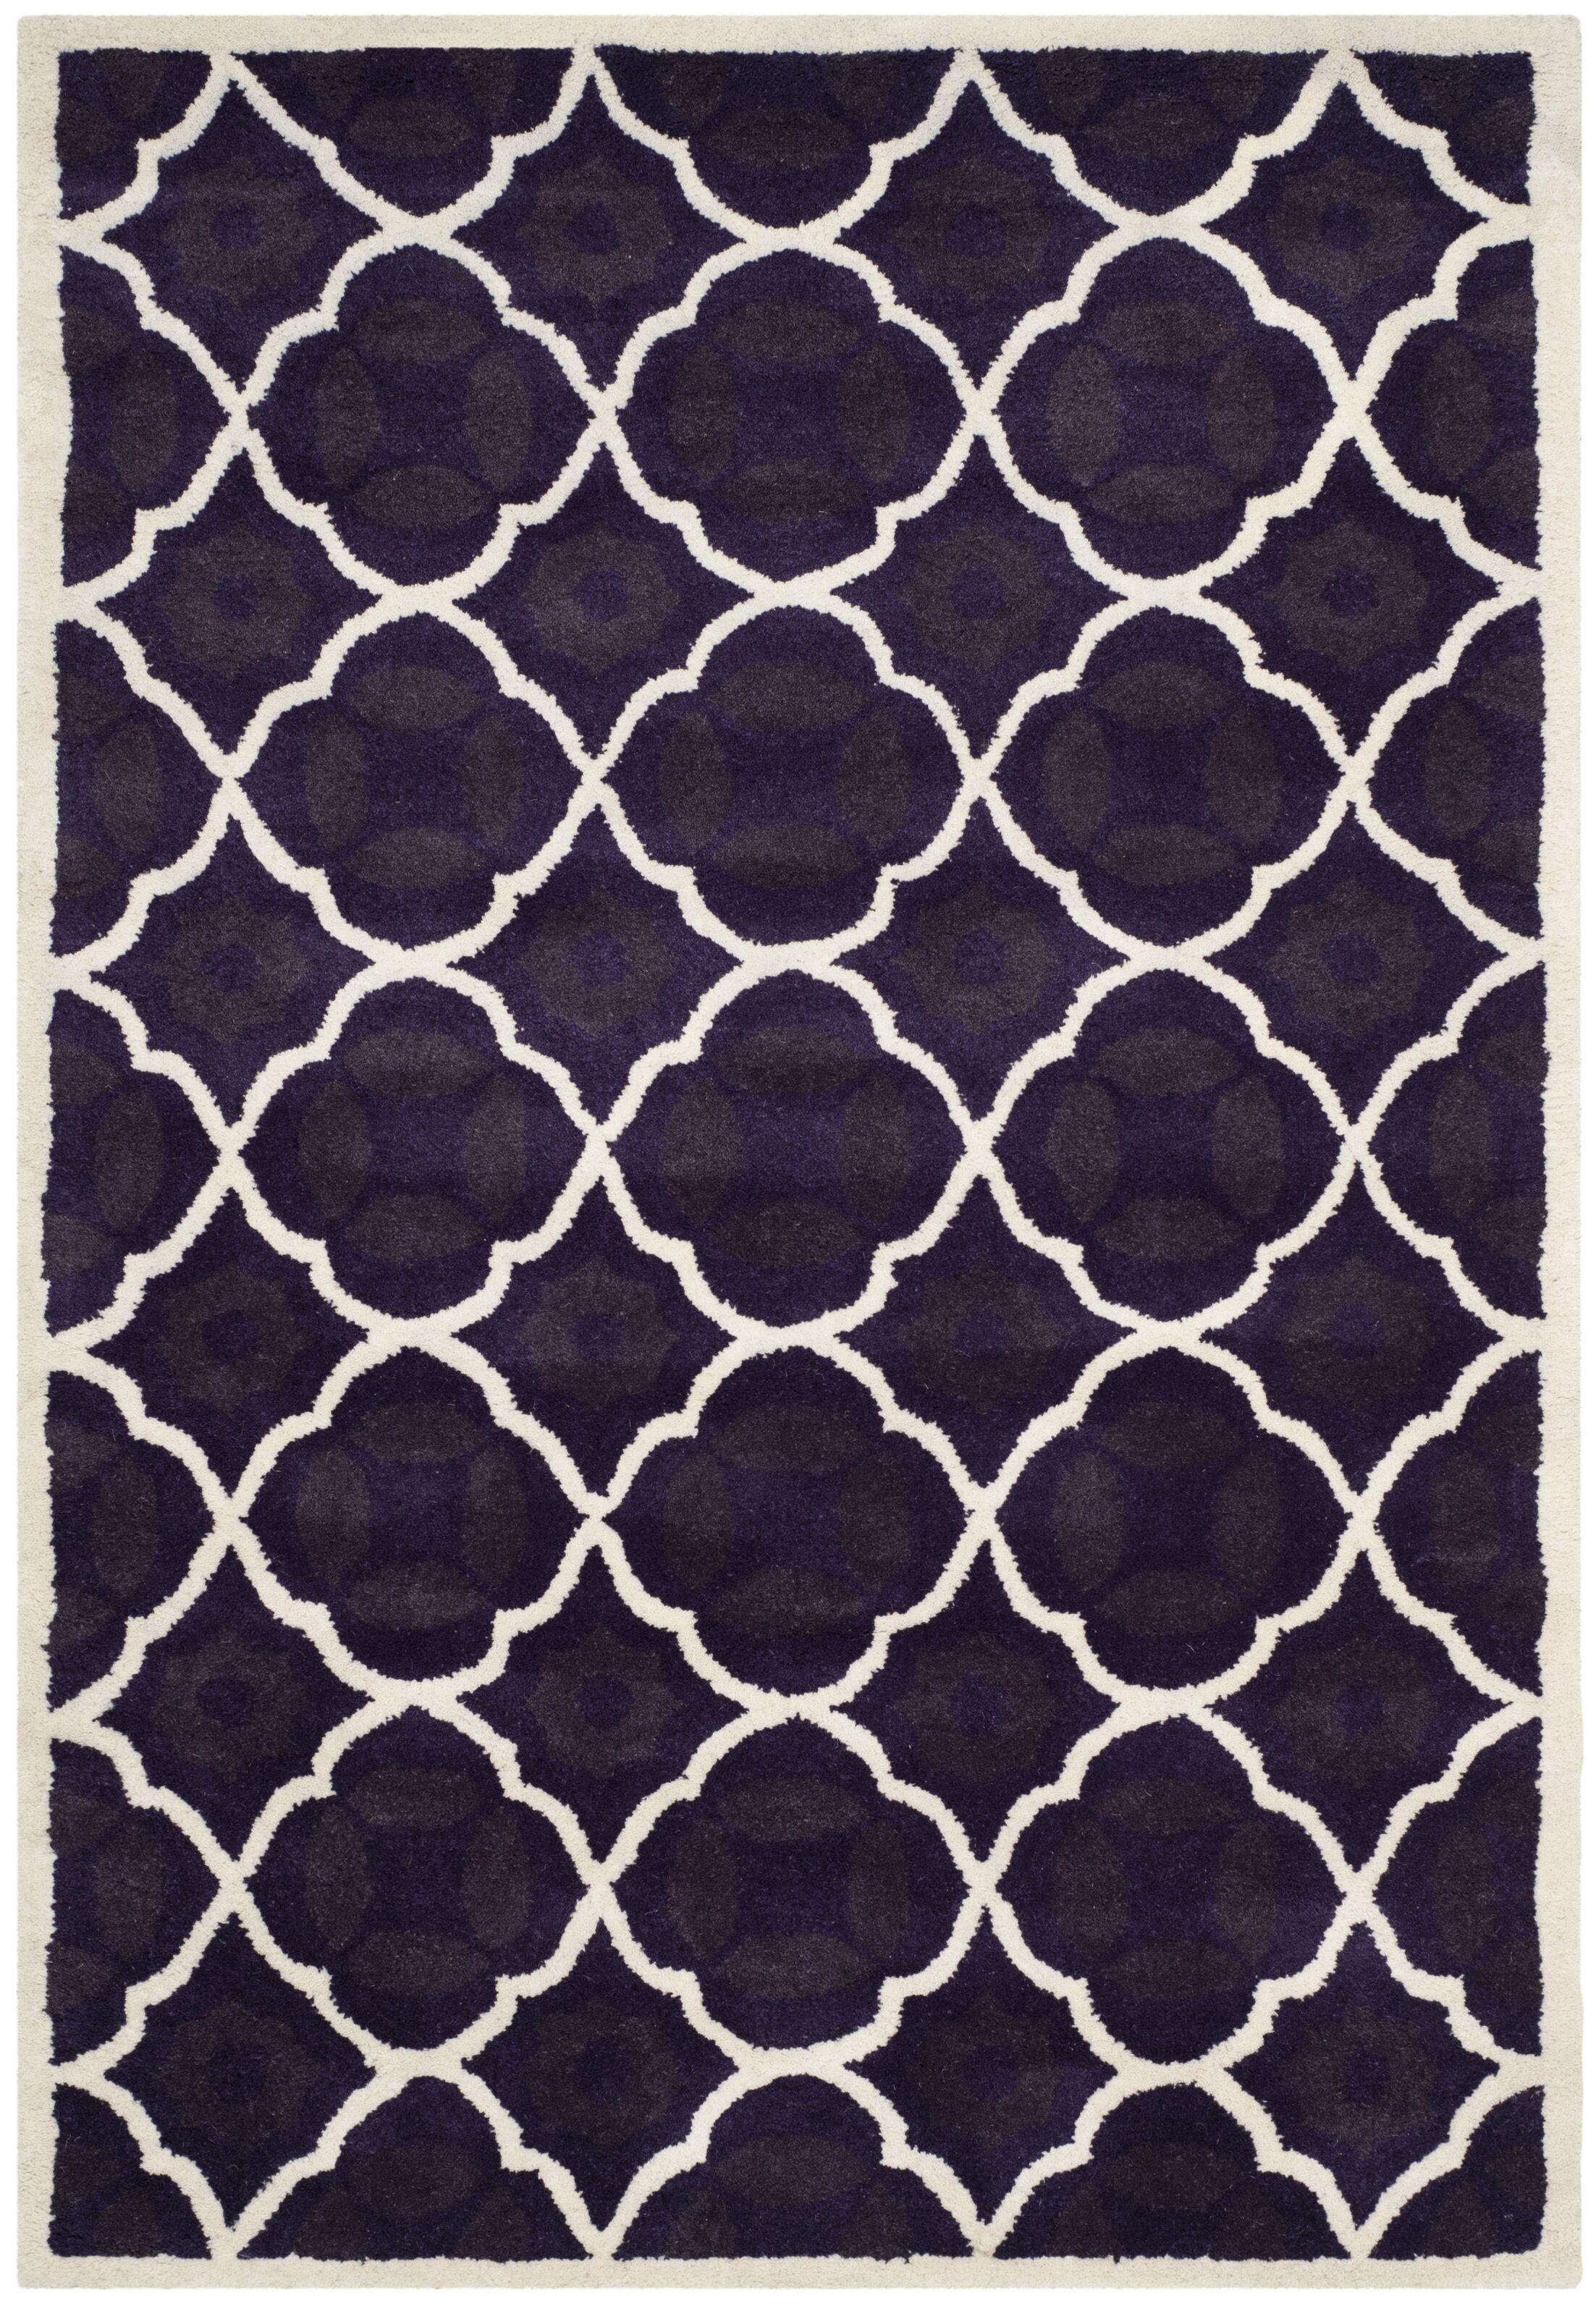 Wilkin Purple/Ivory Moroccan Area Rug Rug Size: Rectangle 4' x 6'